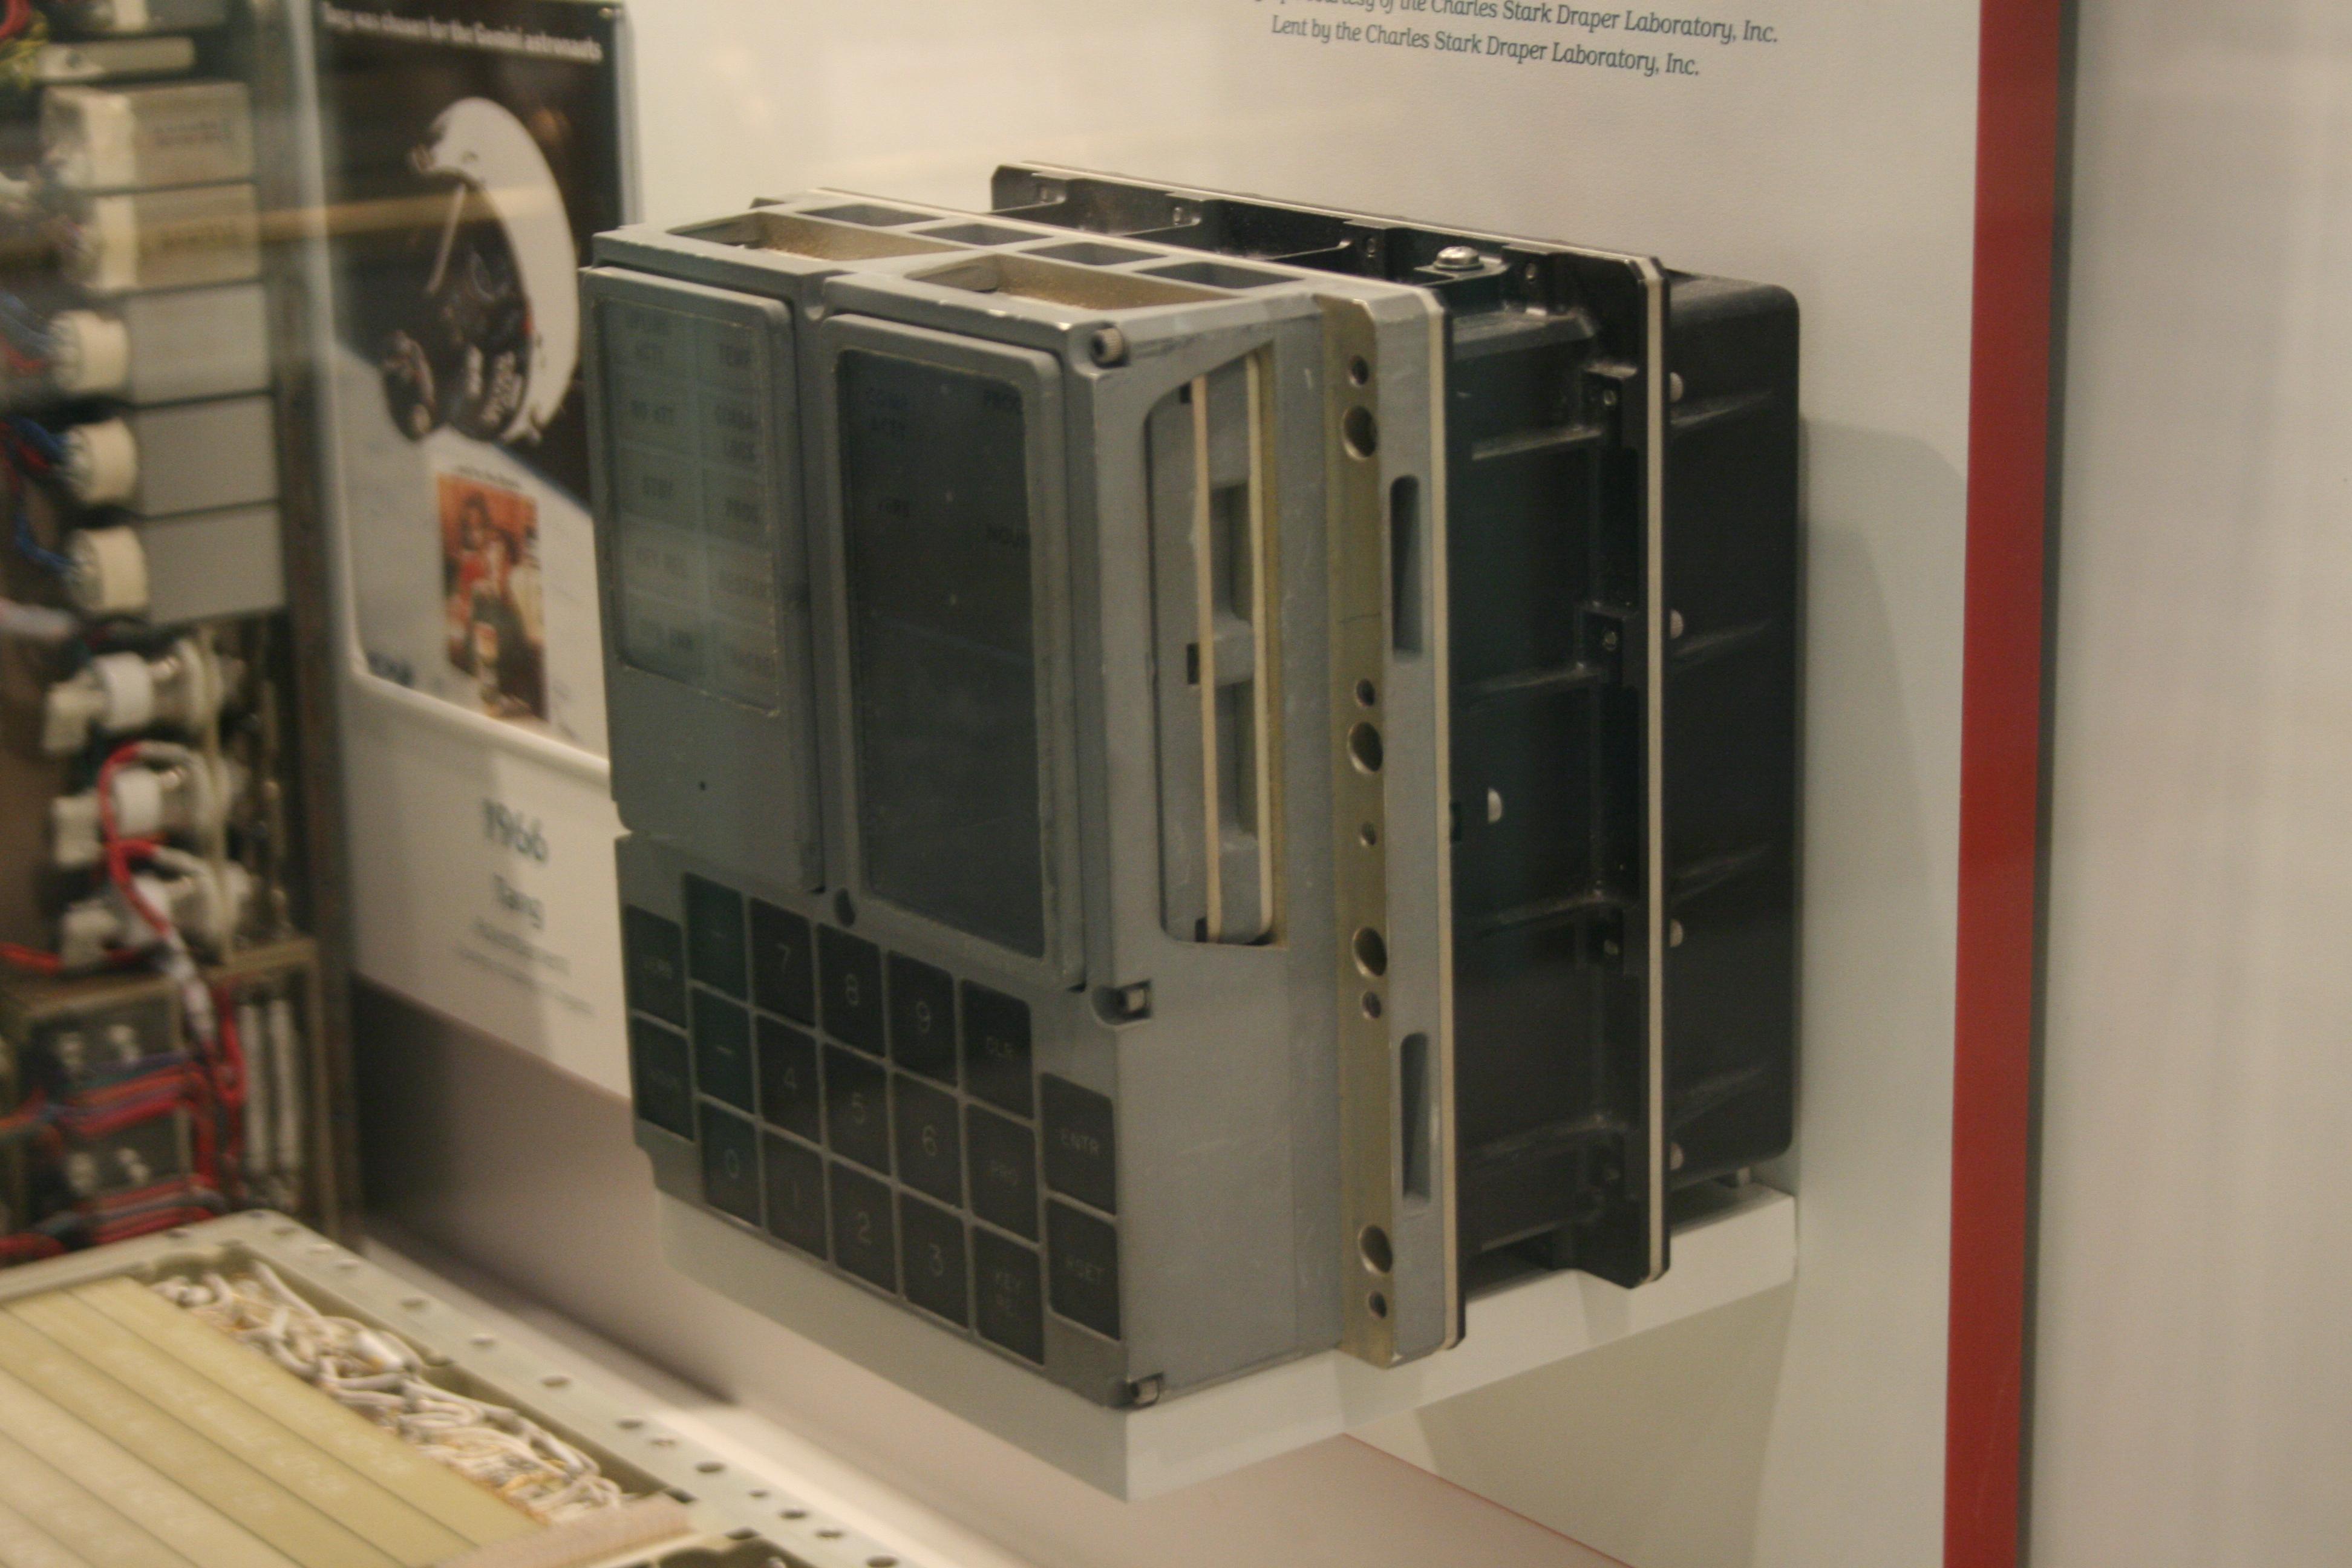 File:Apollo Guidance Computer (NASM).JPG - Wikimedia Commons